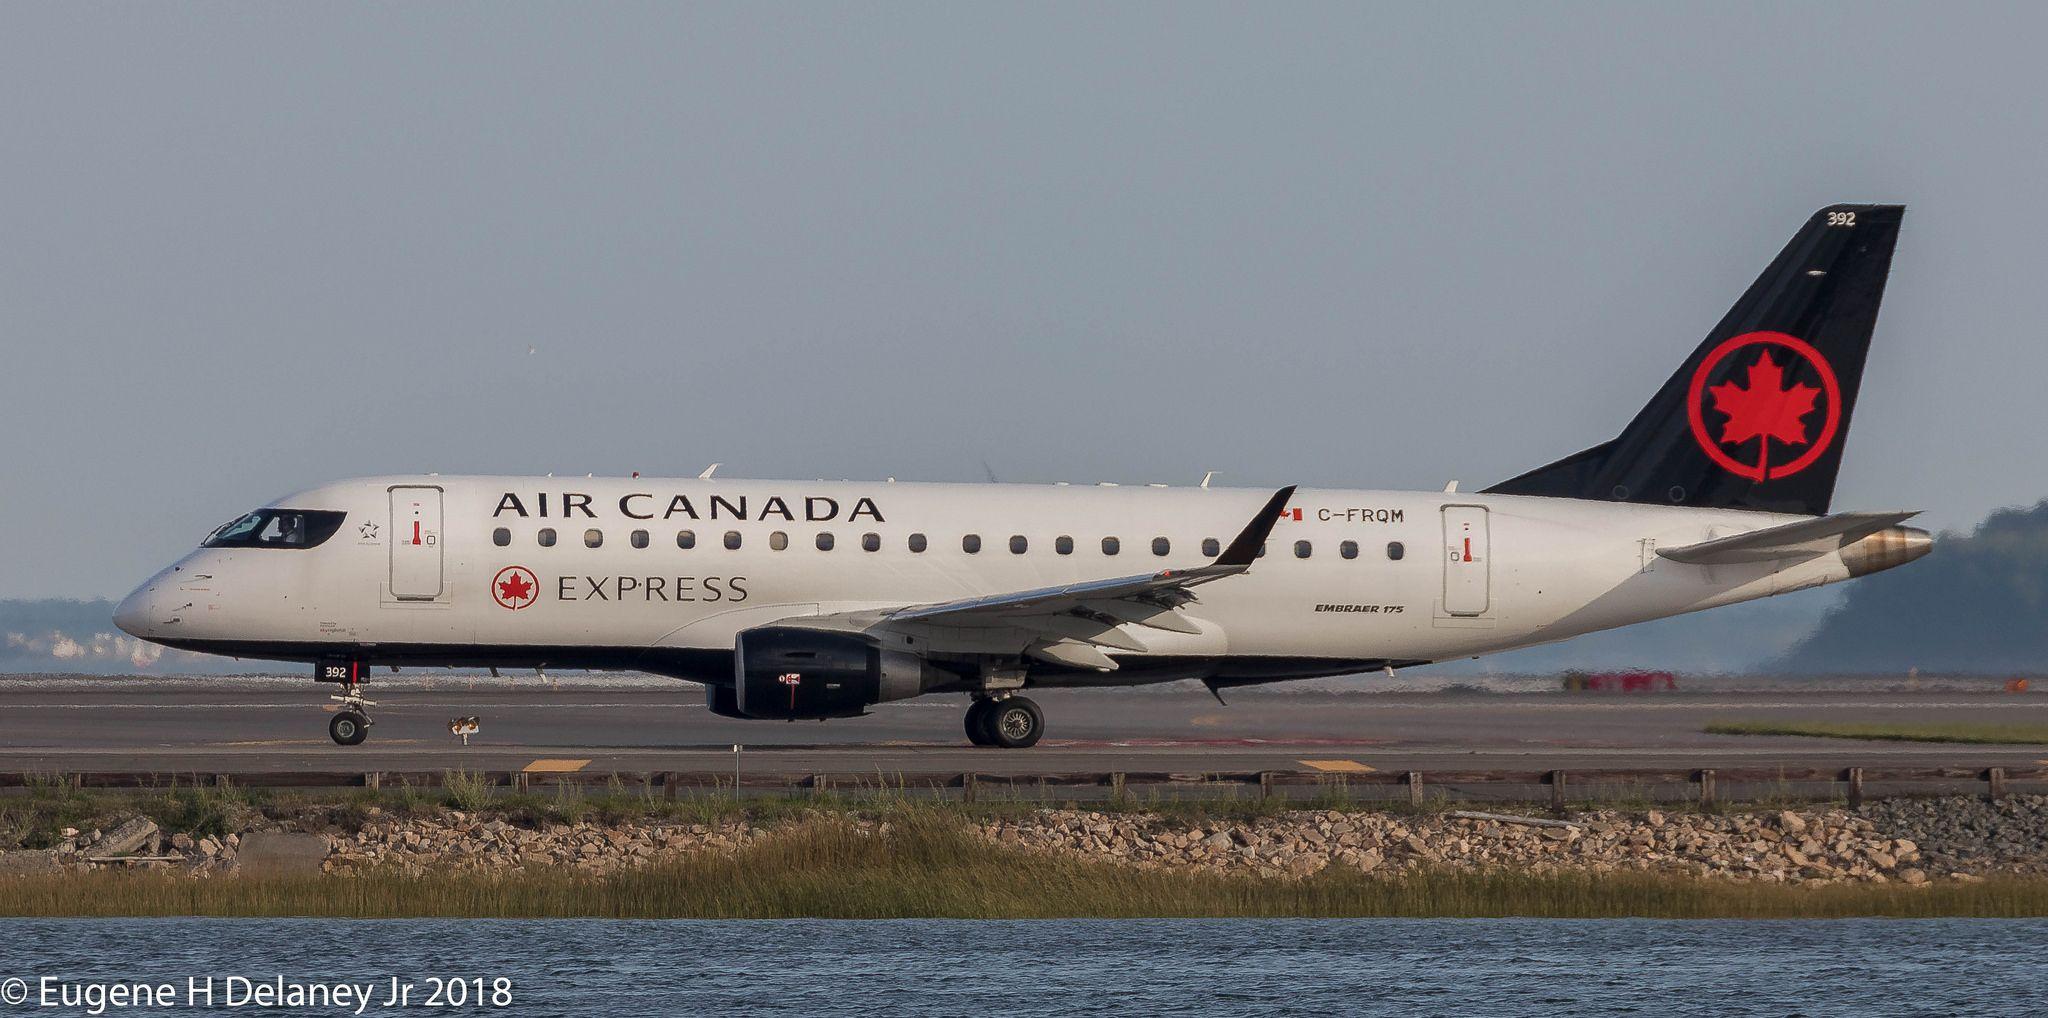 Pin em Embraer/Bombadier/Sukhoi/Mitsubishi Jets